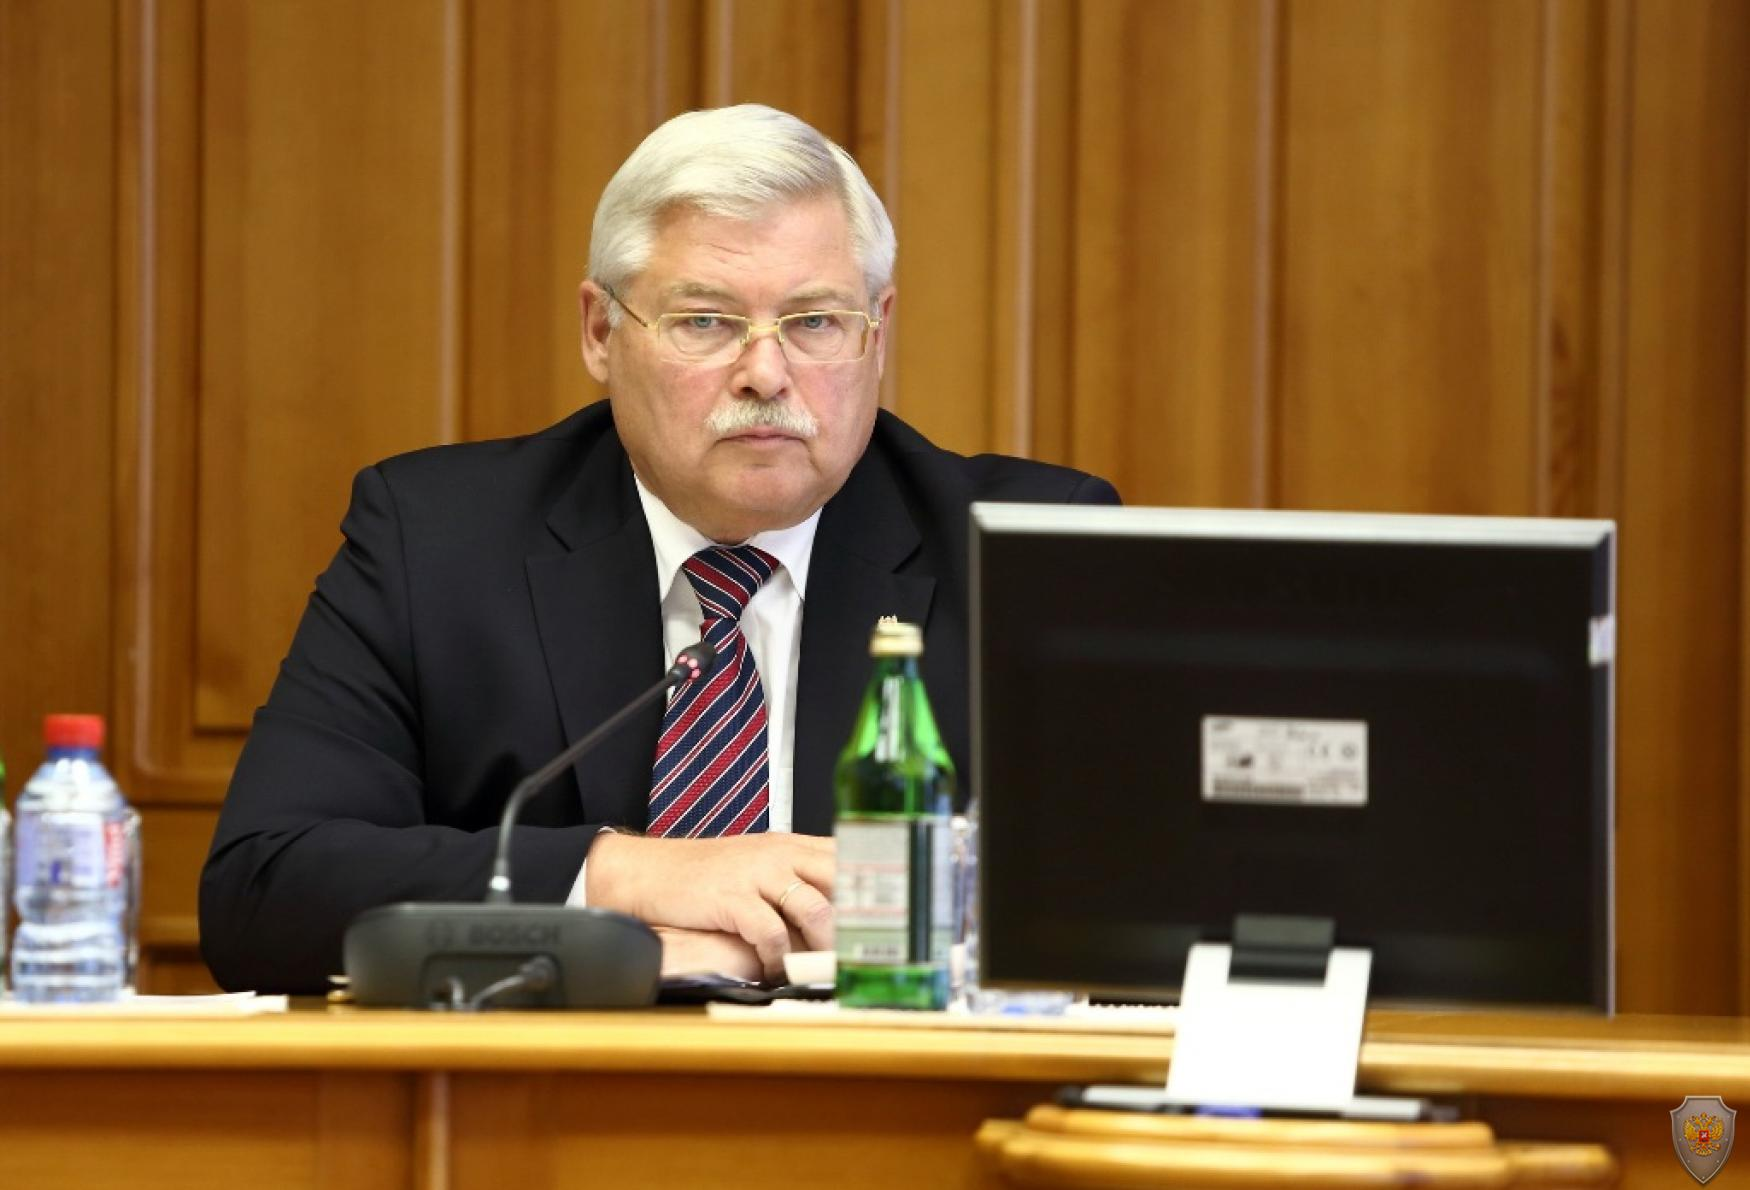 Губернатор Томской области - председатель АТК Томской области Жвачкин С.А.